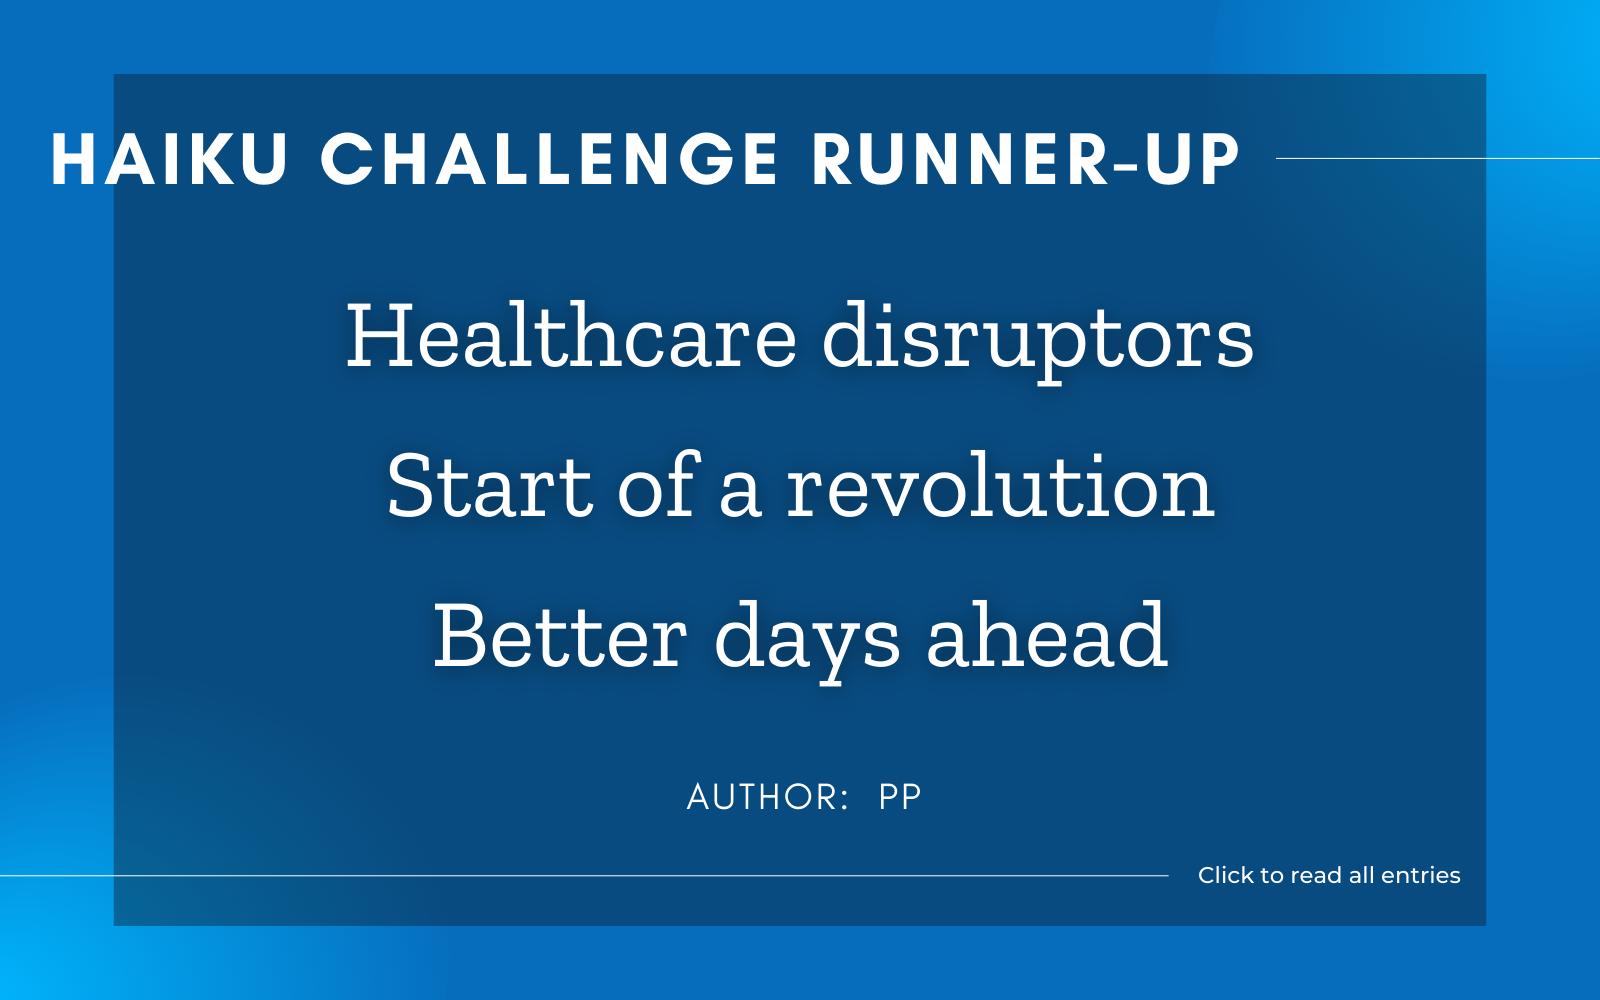 Healthcare disruptors Start of a revolution Better days ahead